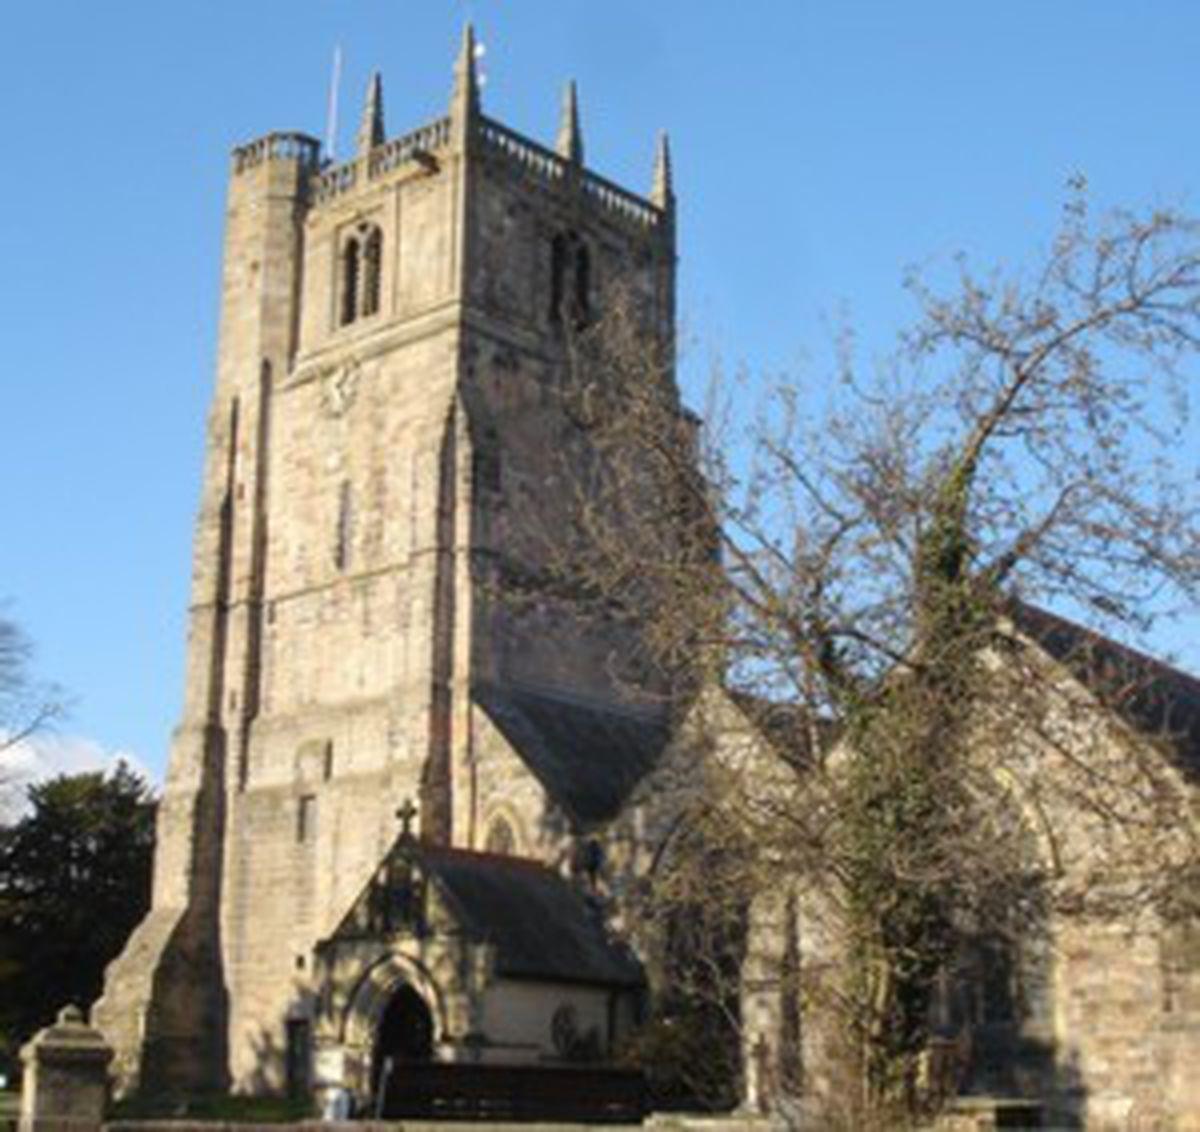 St Oswald's Parish Church in Oswestry